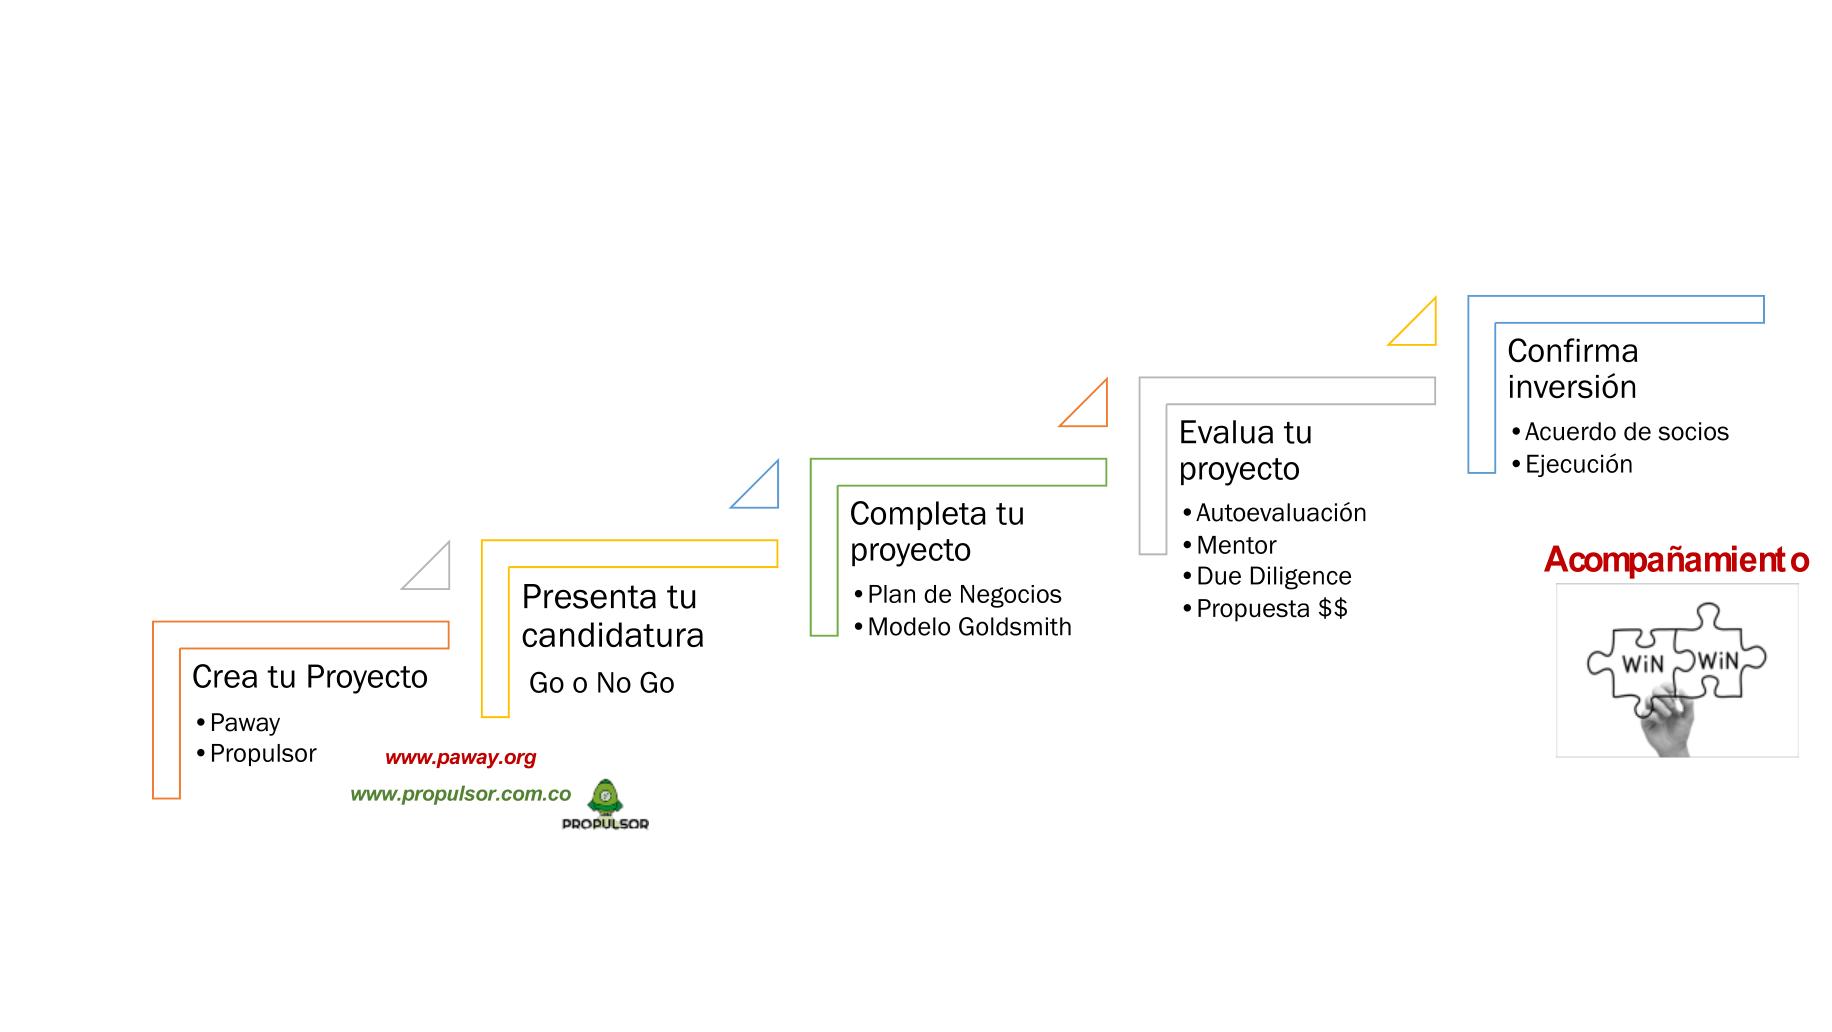 Figura Nº1 - Contenido Plan de Negocios